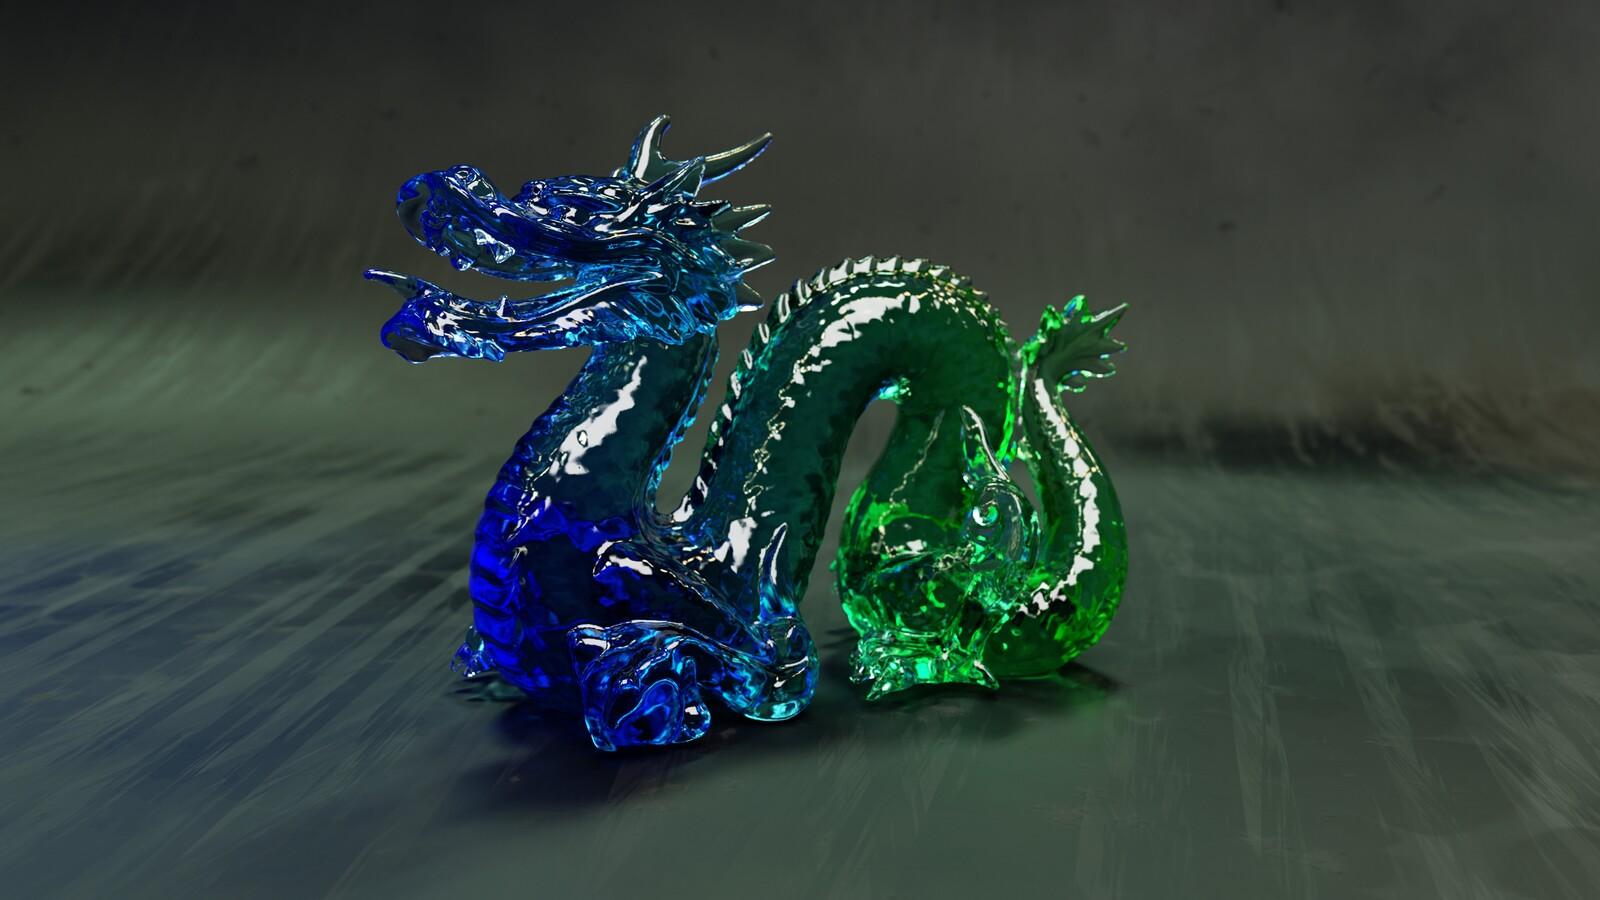 Blue-Green Glass Dragon